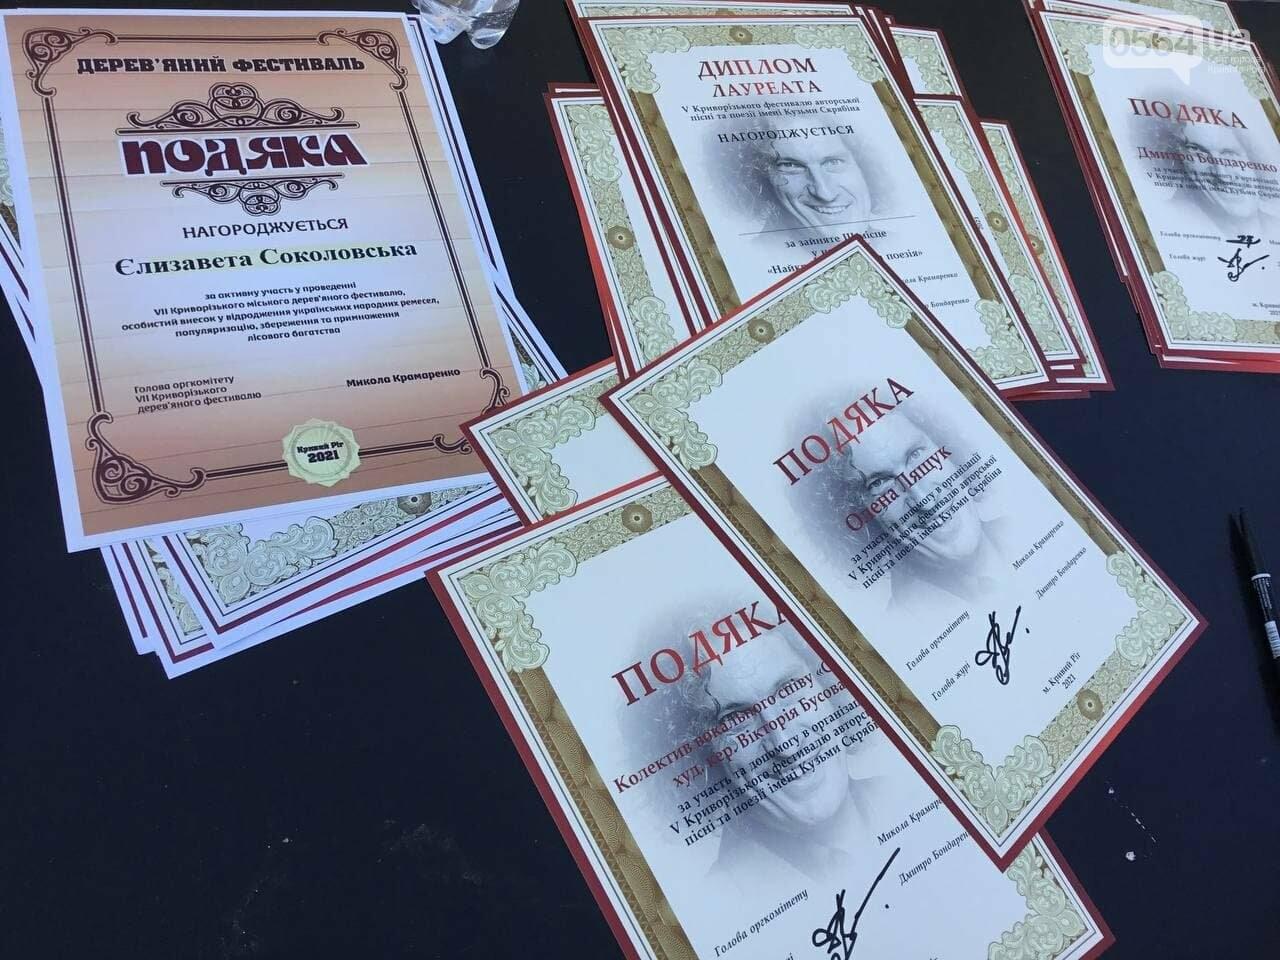 18 конкурсантов представили своё творчество на 5-м Криворожском фестивале имени Кузьмы Скрябина, - ФОТО, ВИДЕО, фото-21